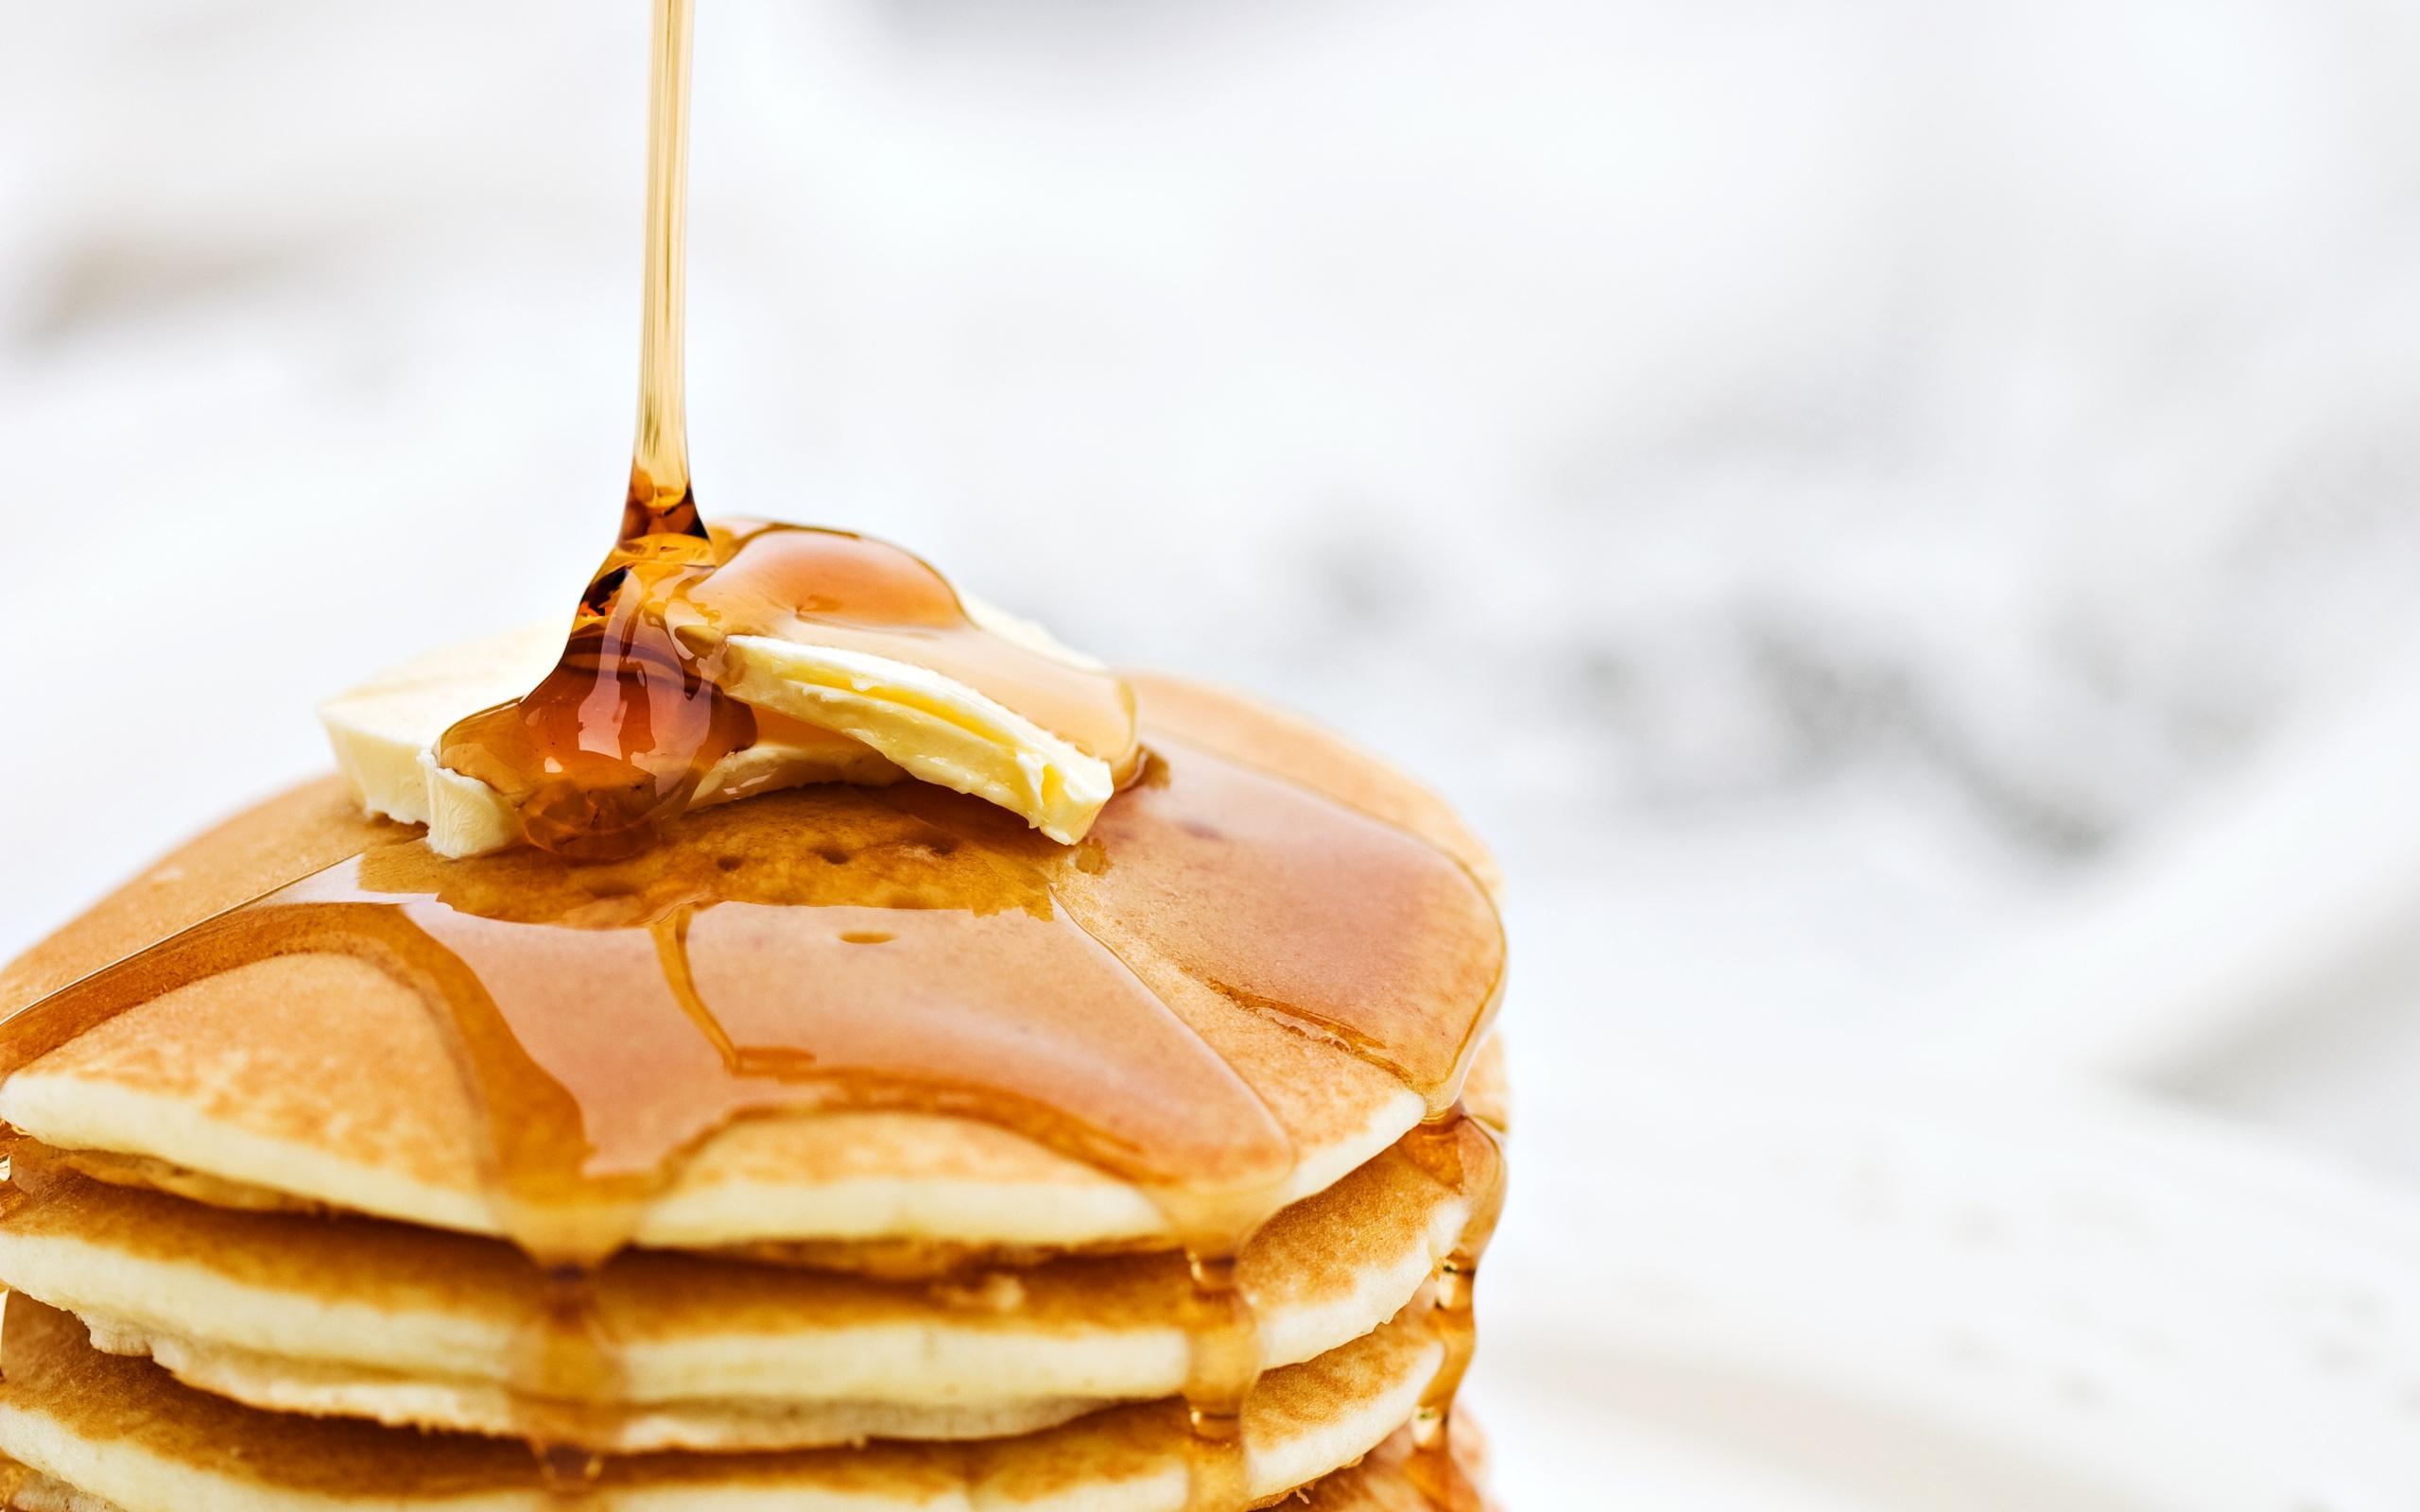 Awesome Pancakes Wallpaper